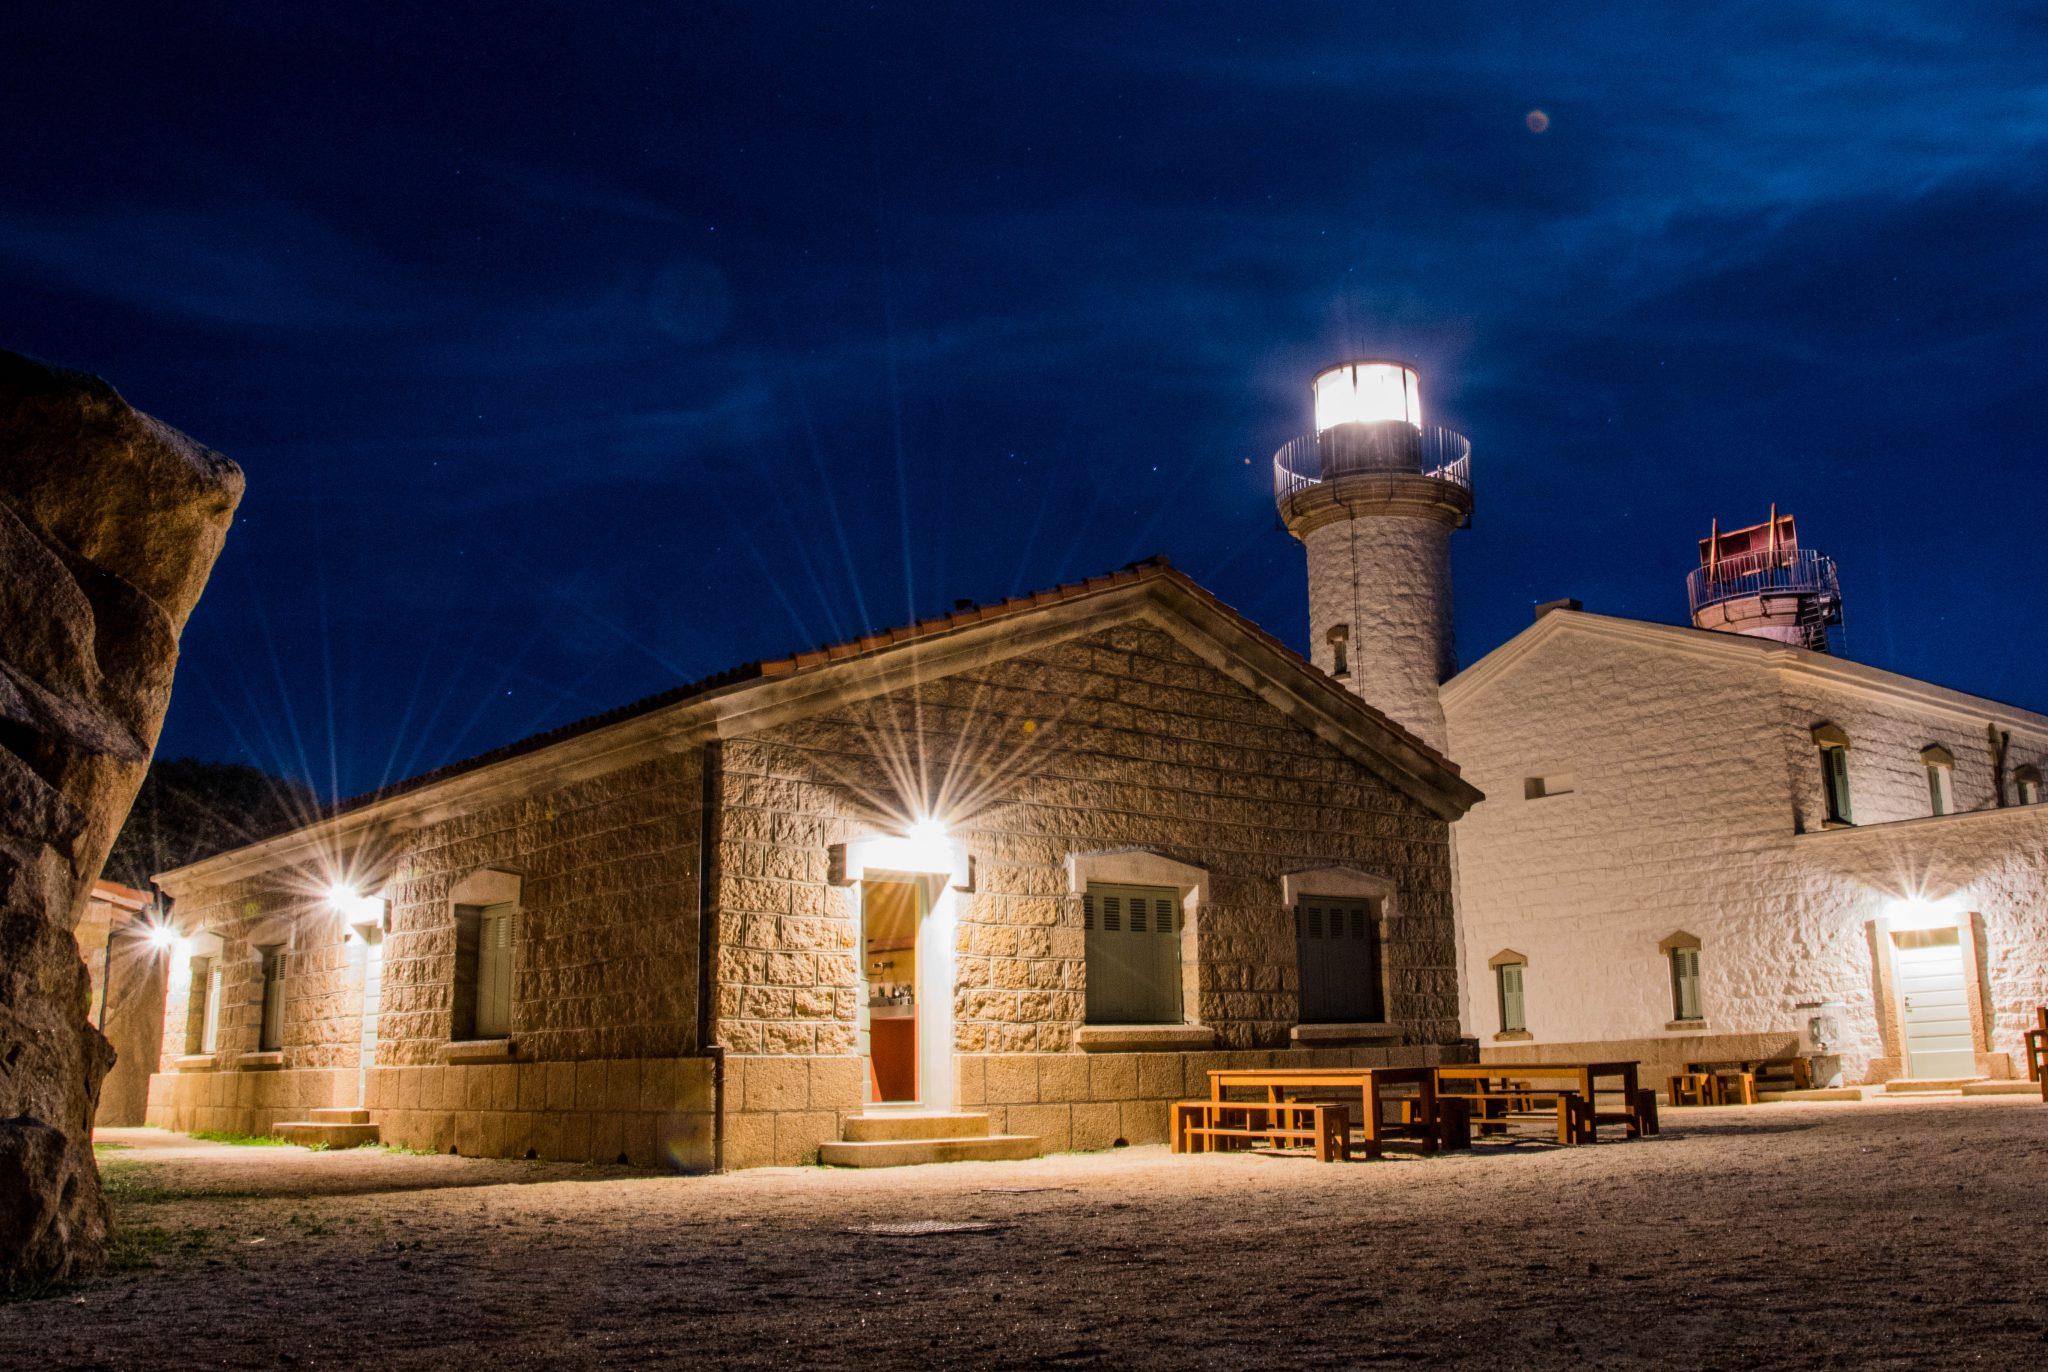 Refuge phare de Senetosa de nuit près de Sartène